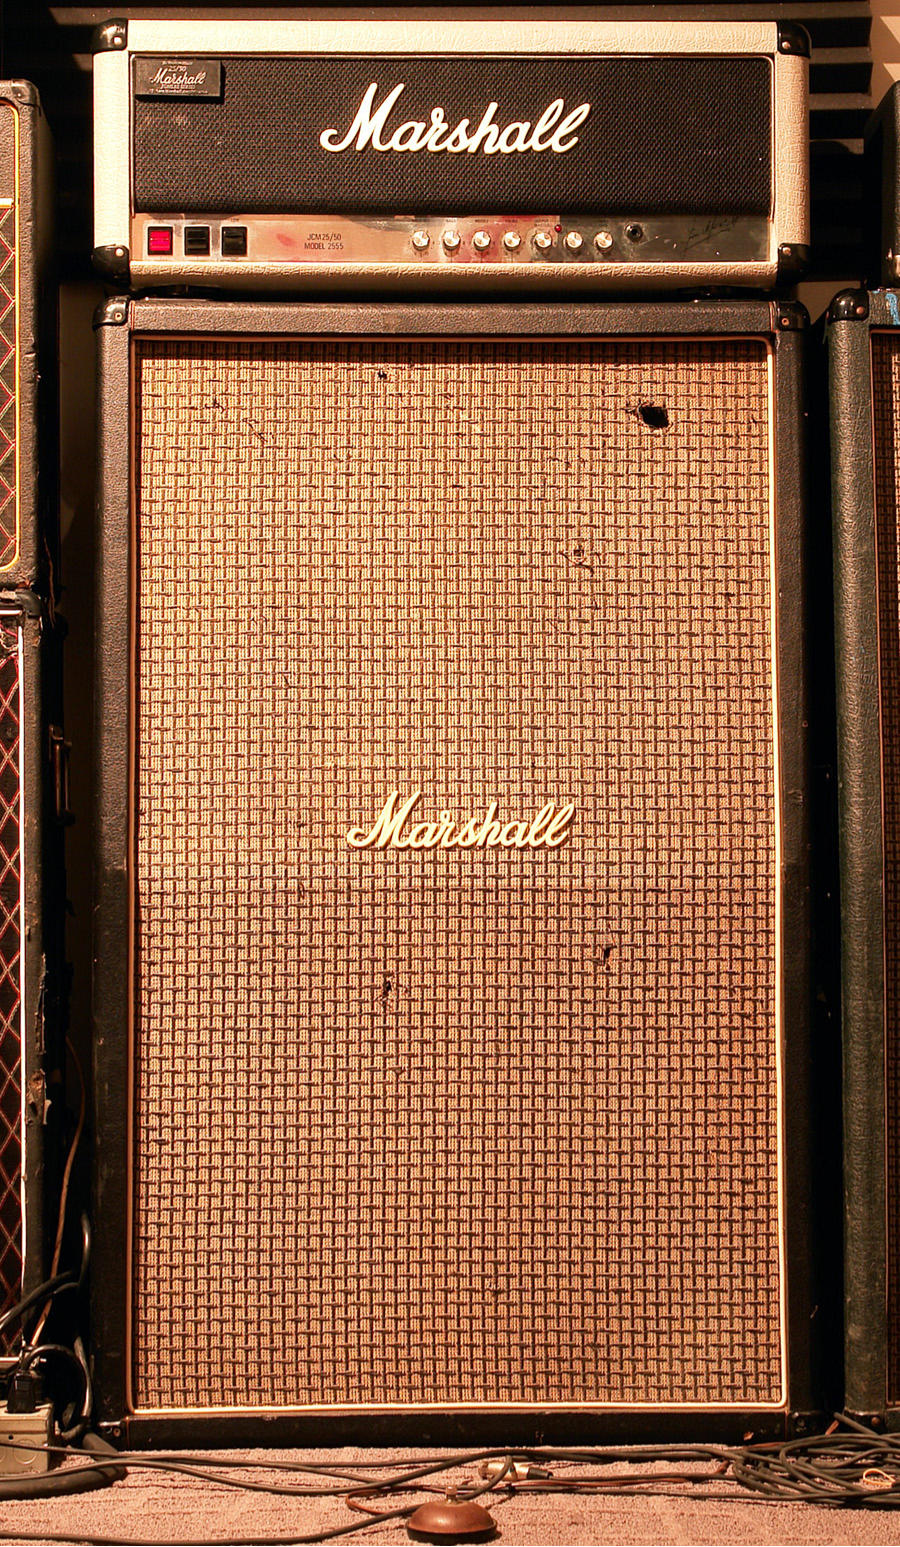 Marshall 2555 Silver Jubilee